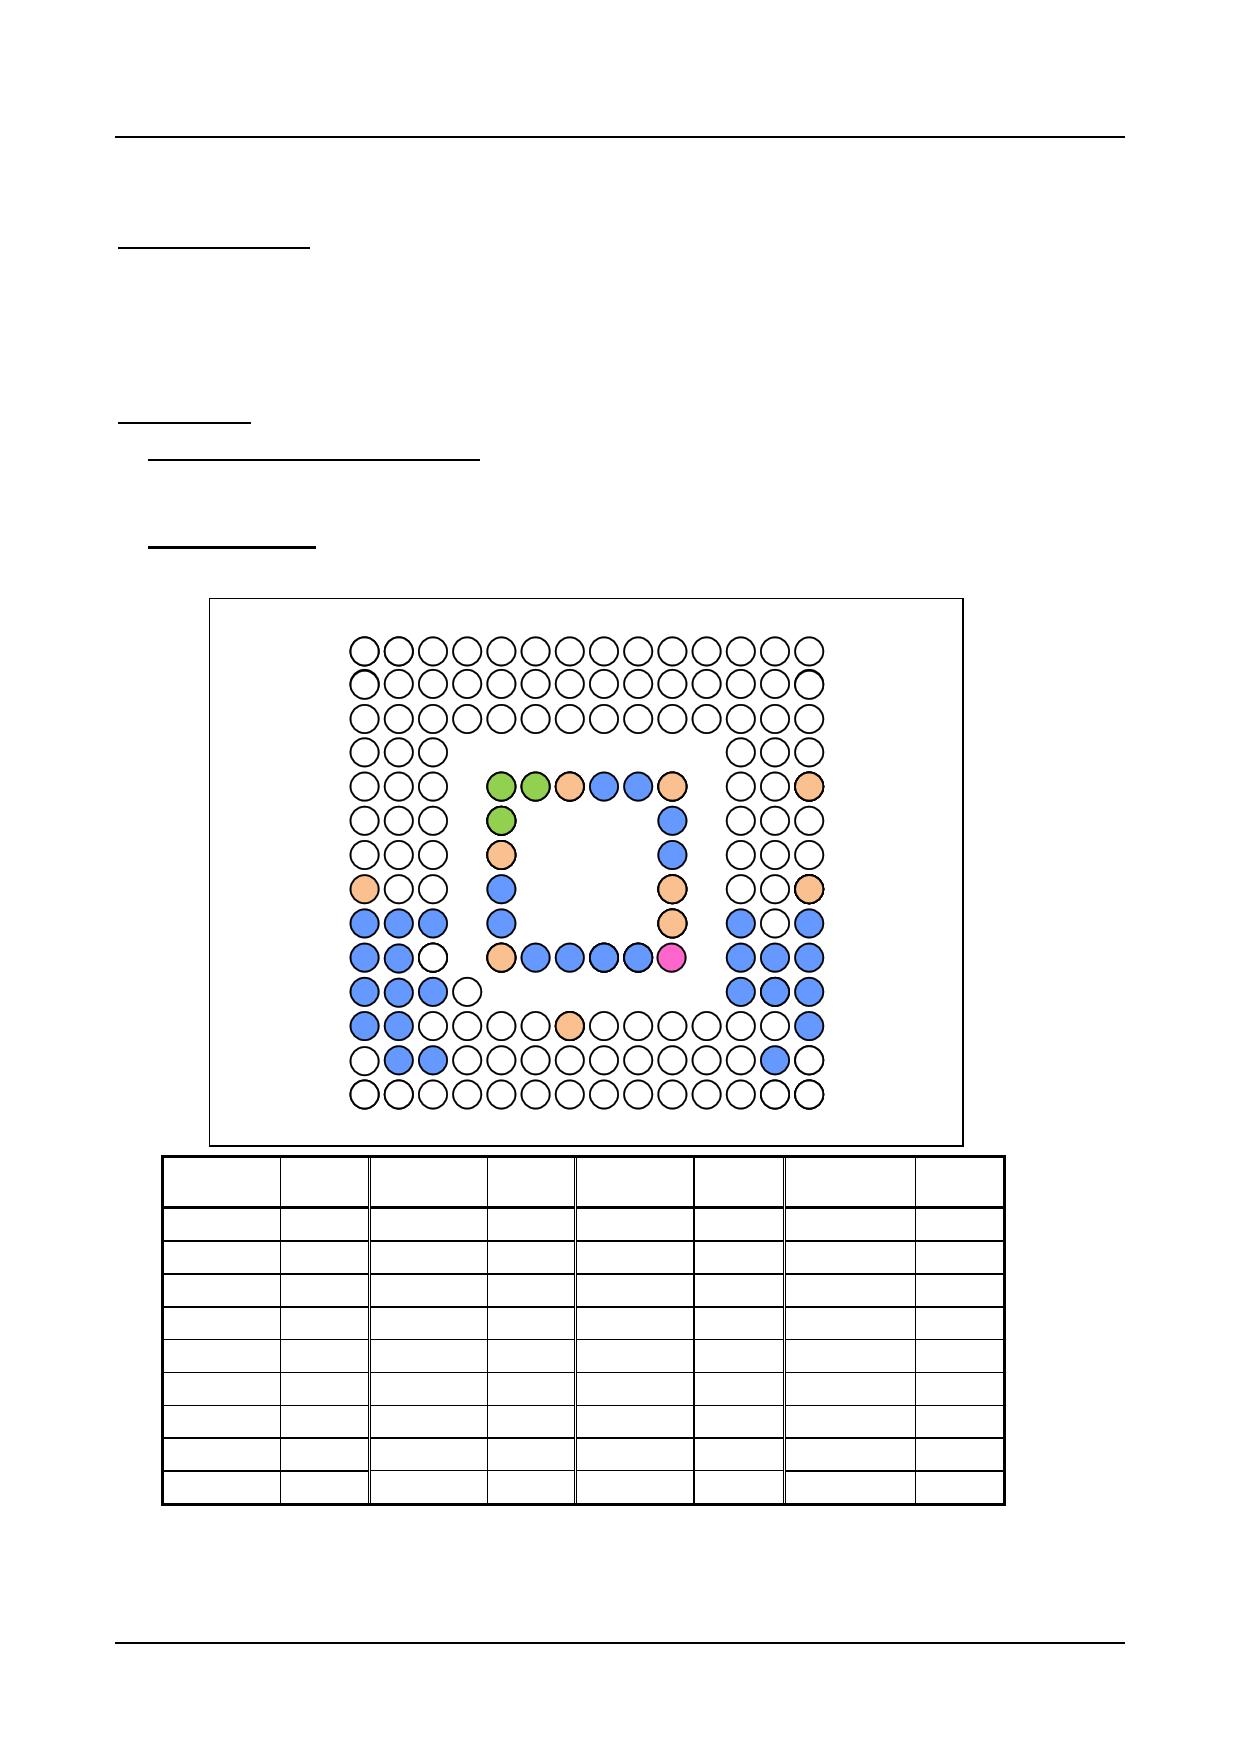 THGBMBG5D1KBAIL image